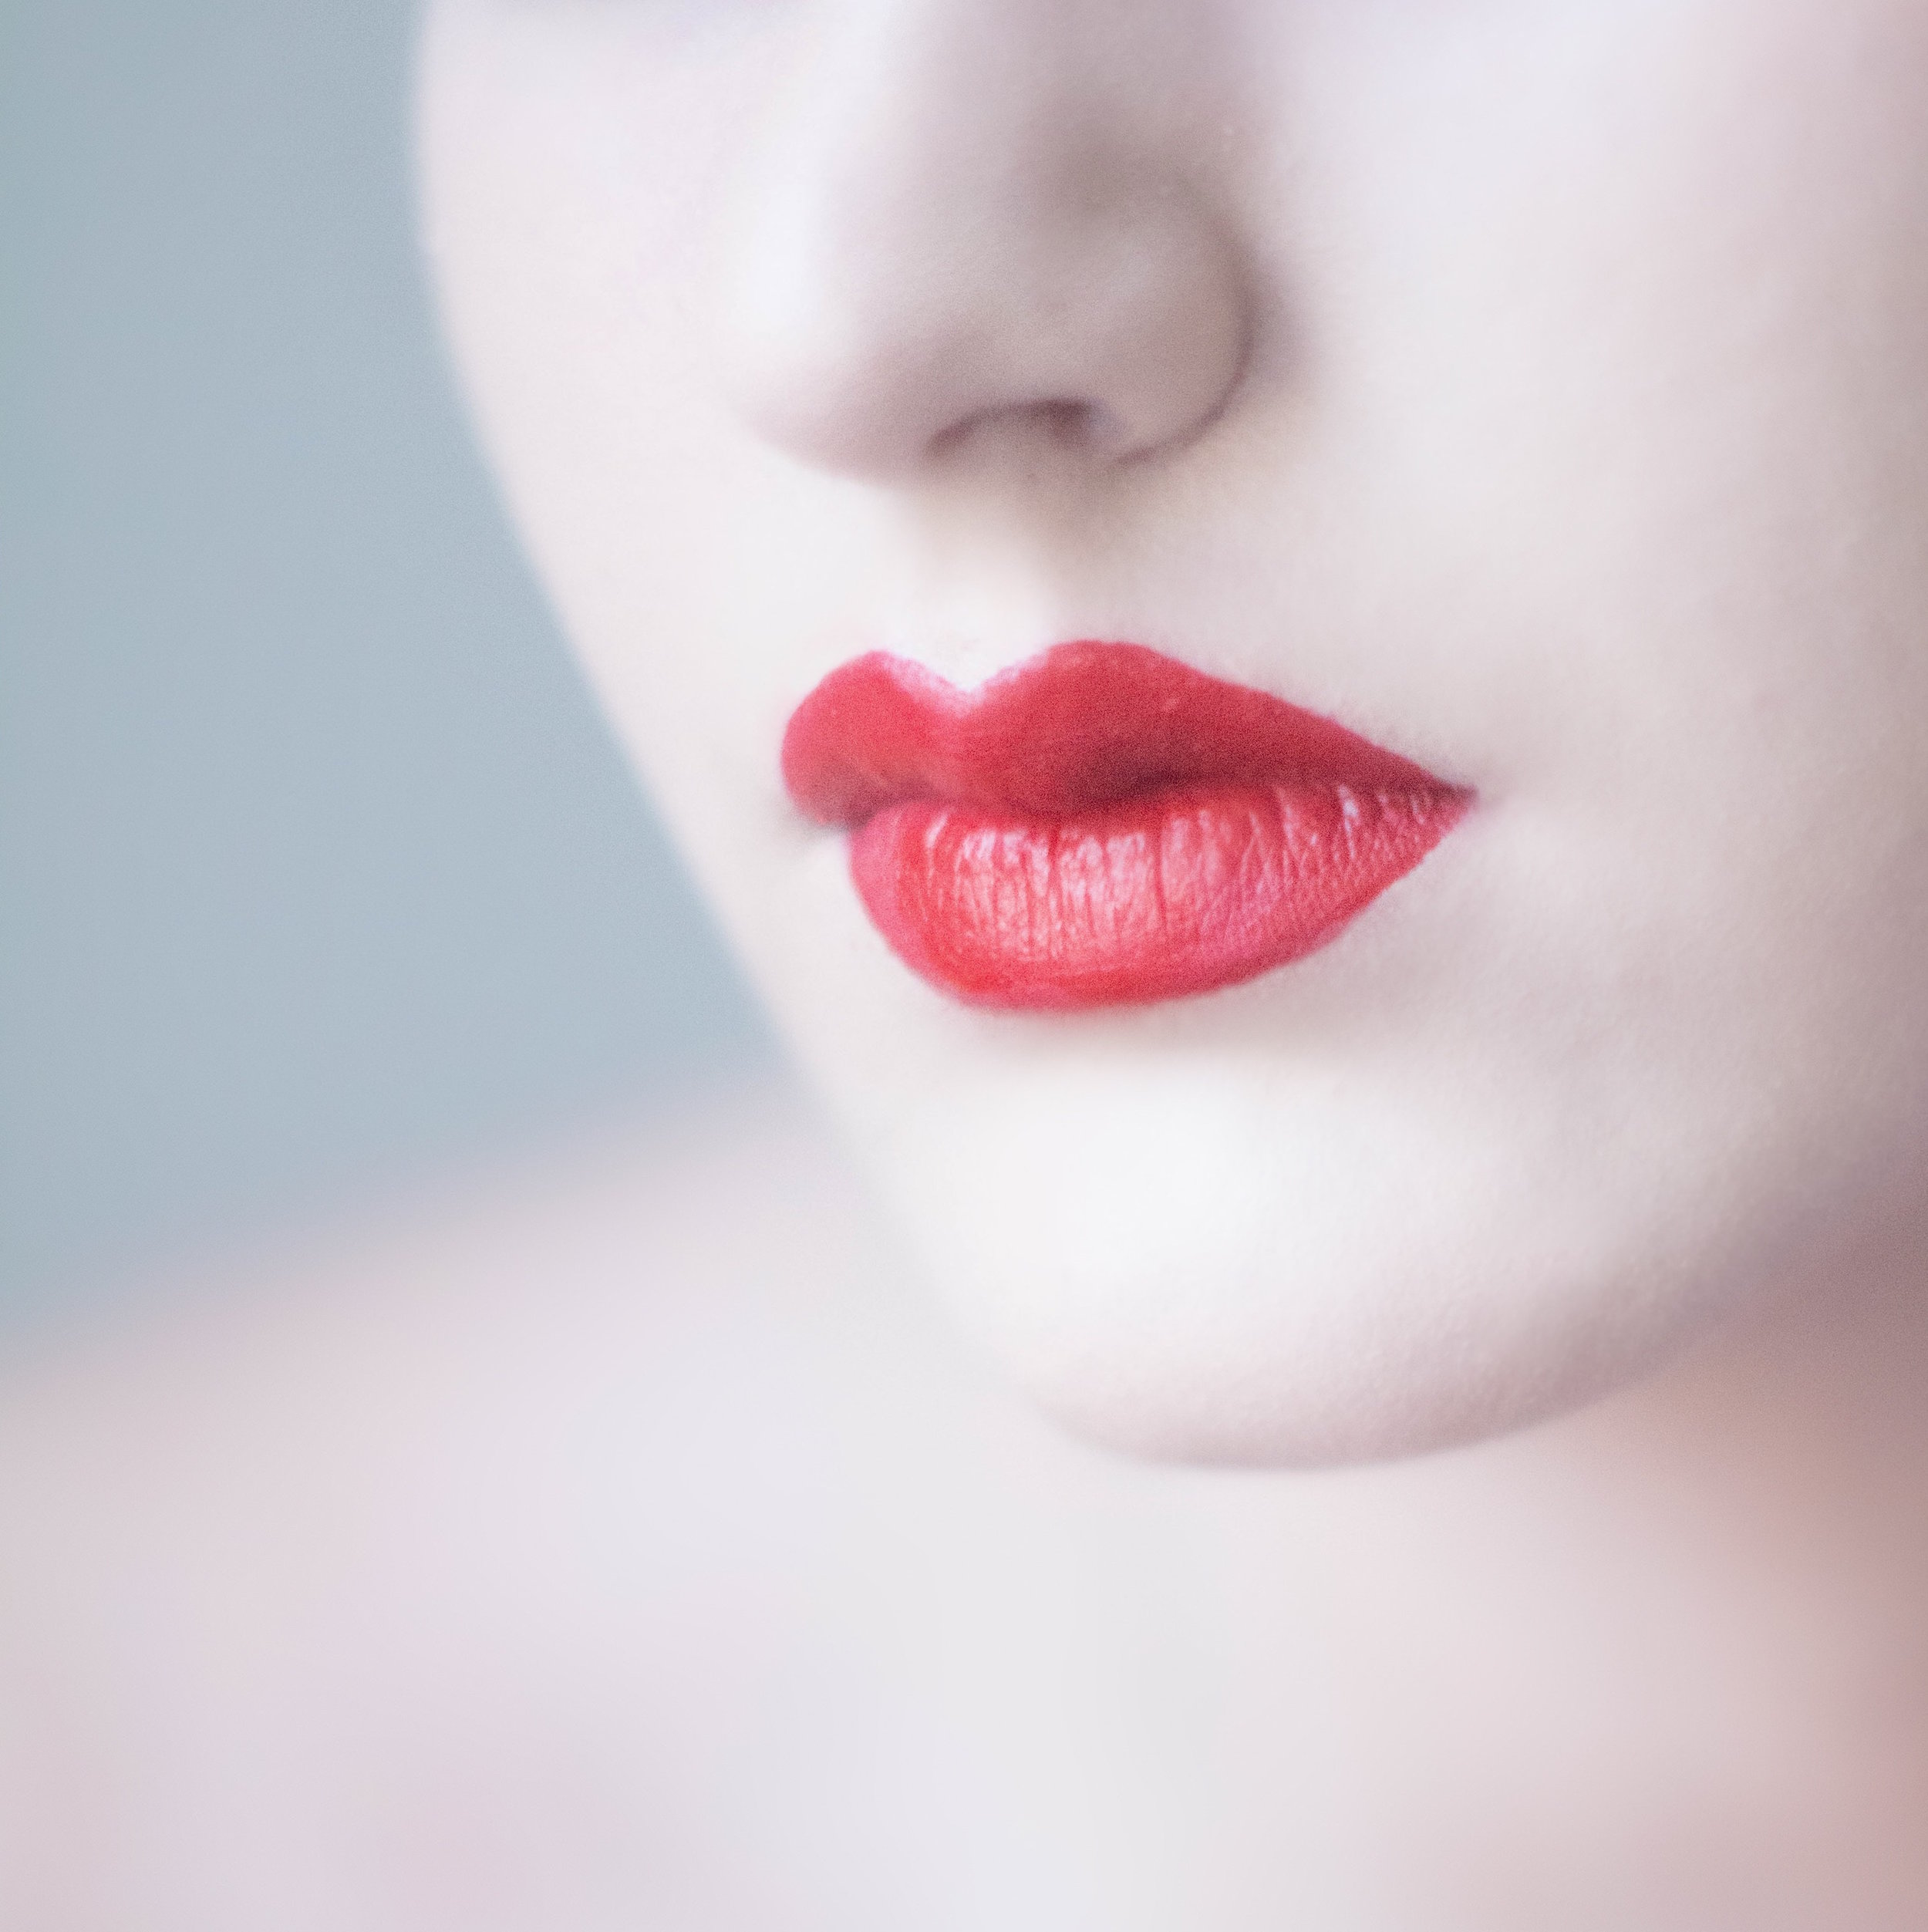 DIY essential oil lip scrub and exfoliator